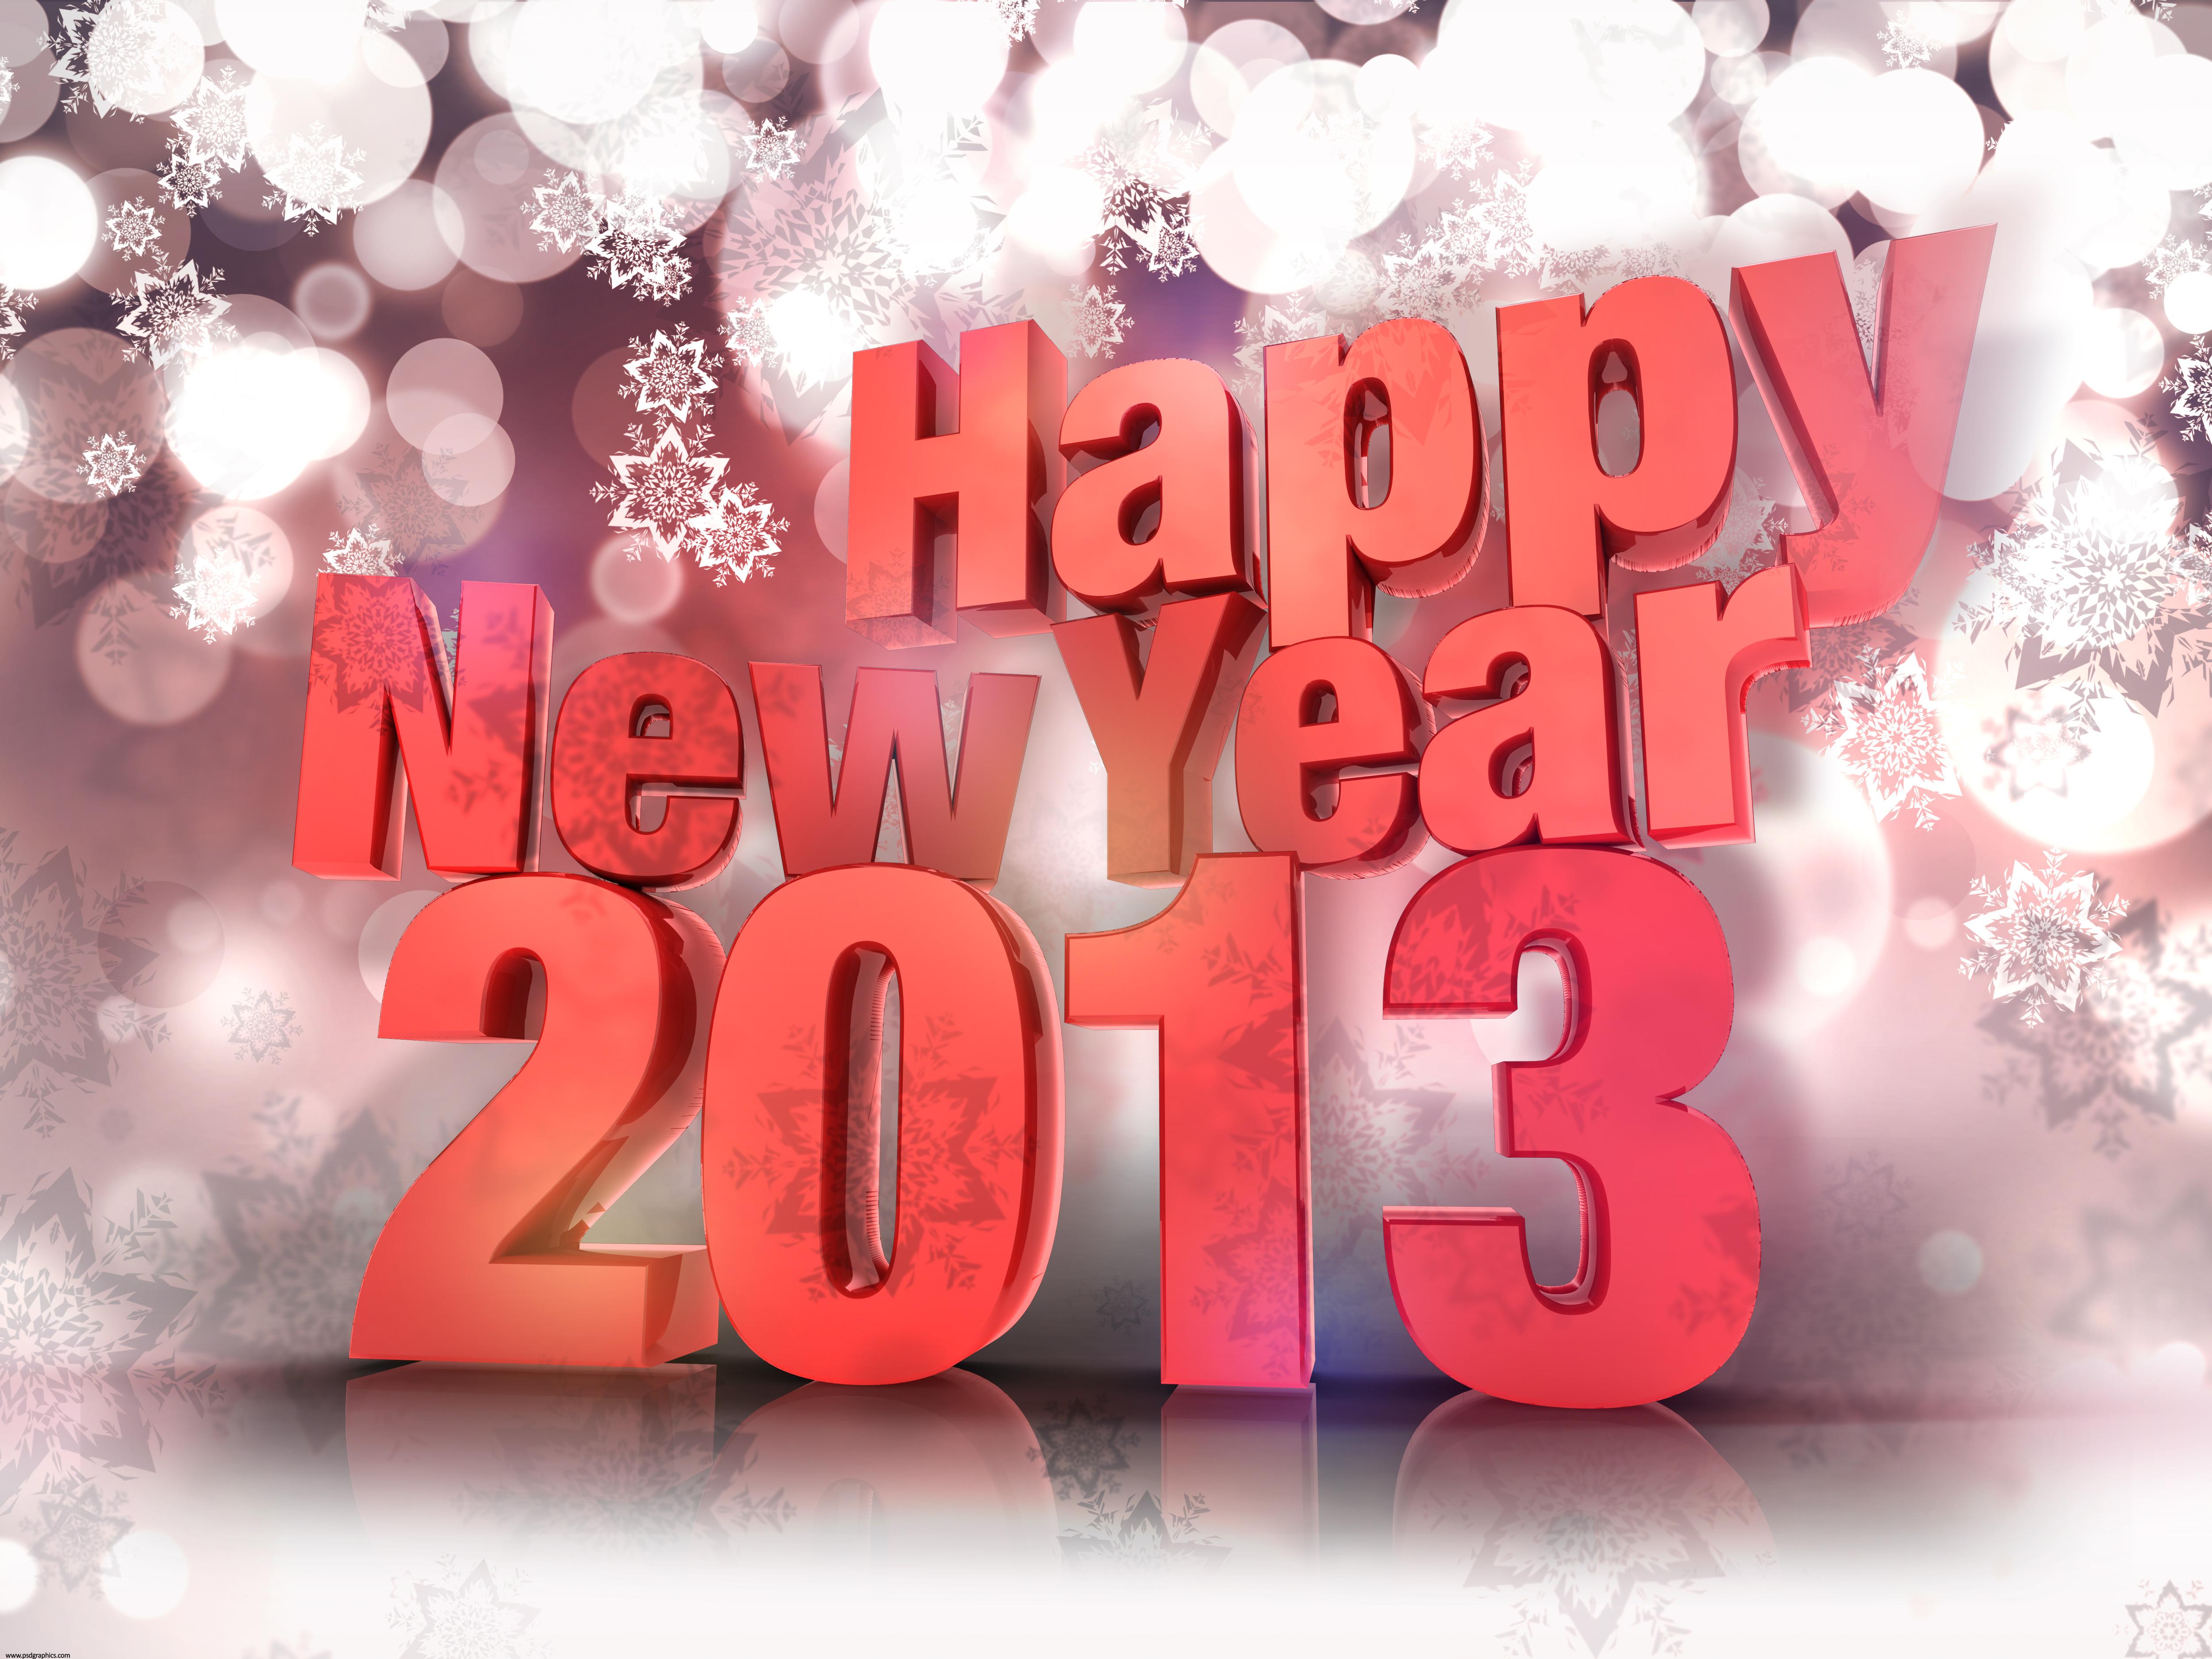 happy new year 2013 - photo #14